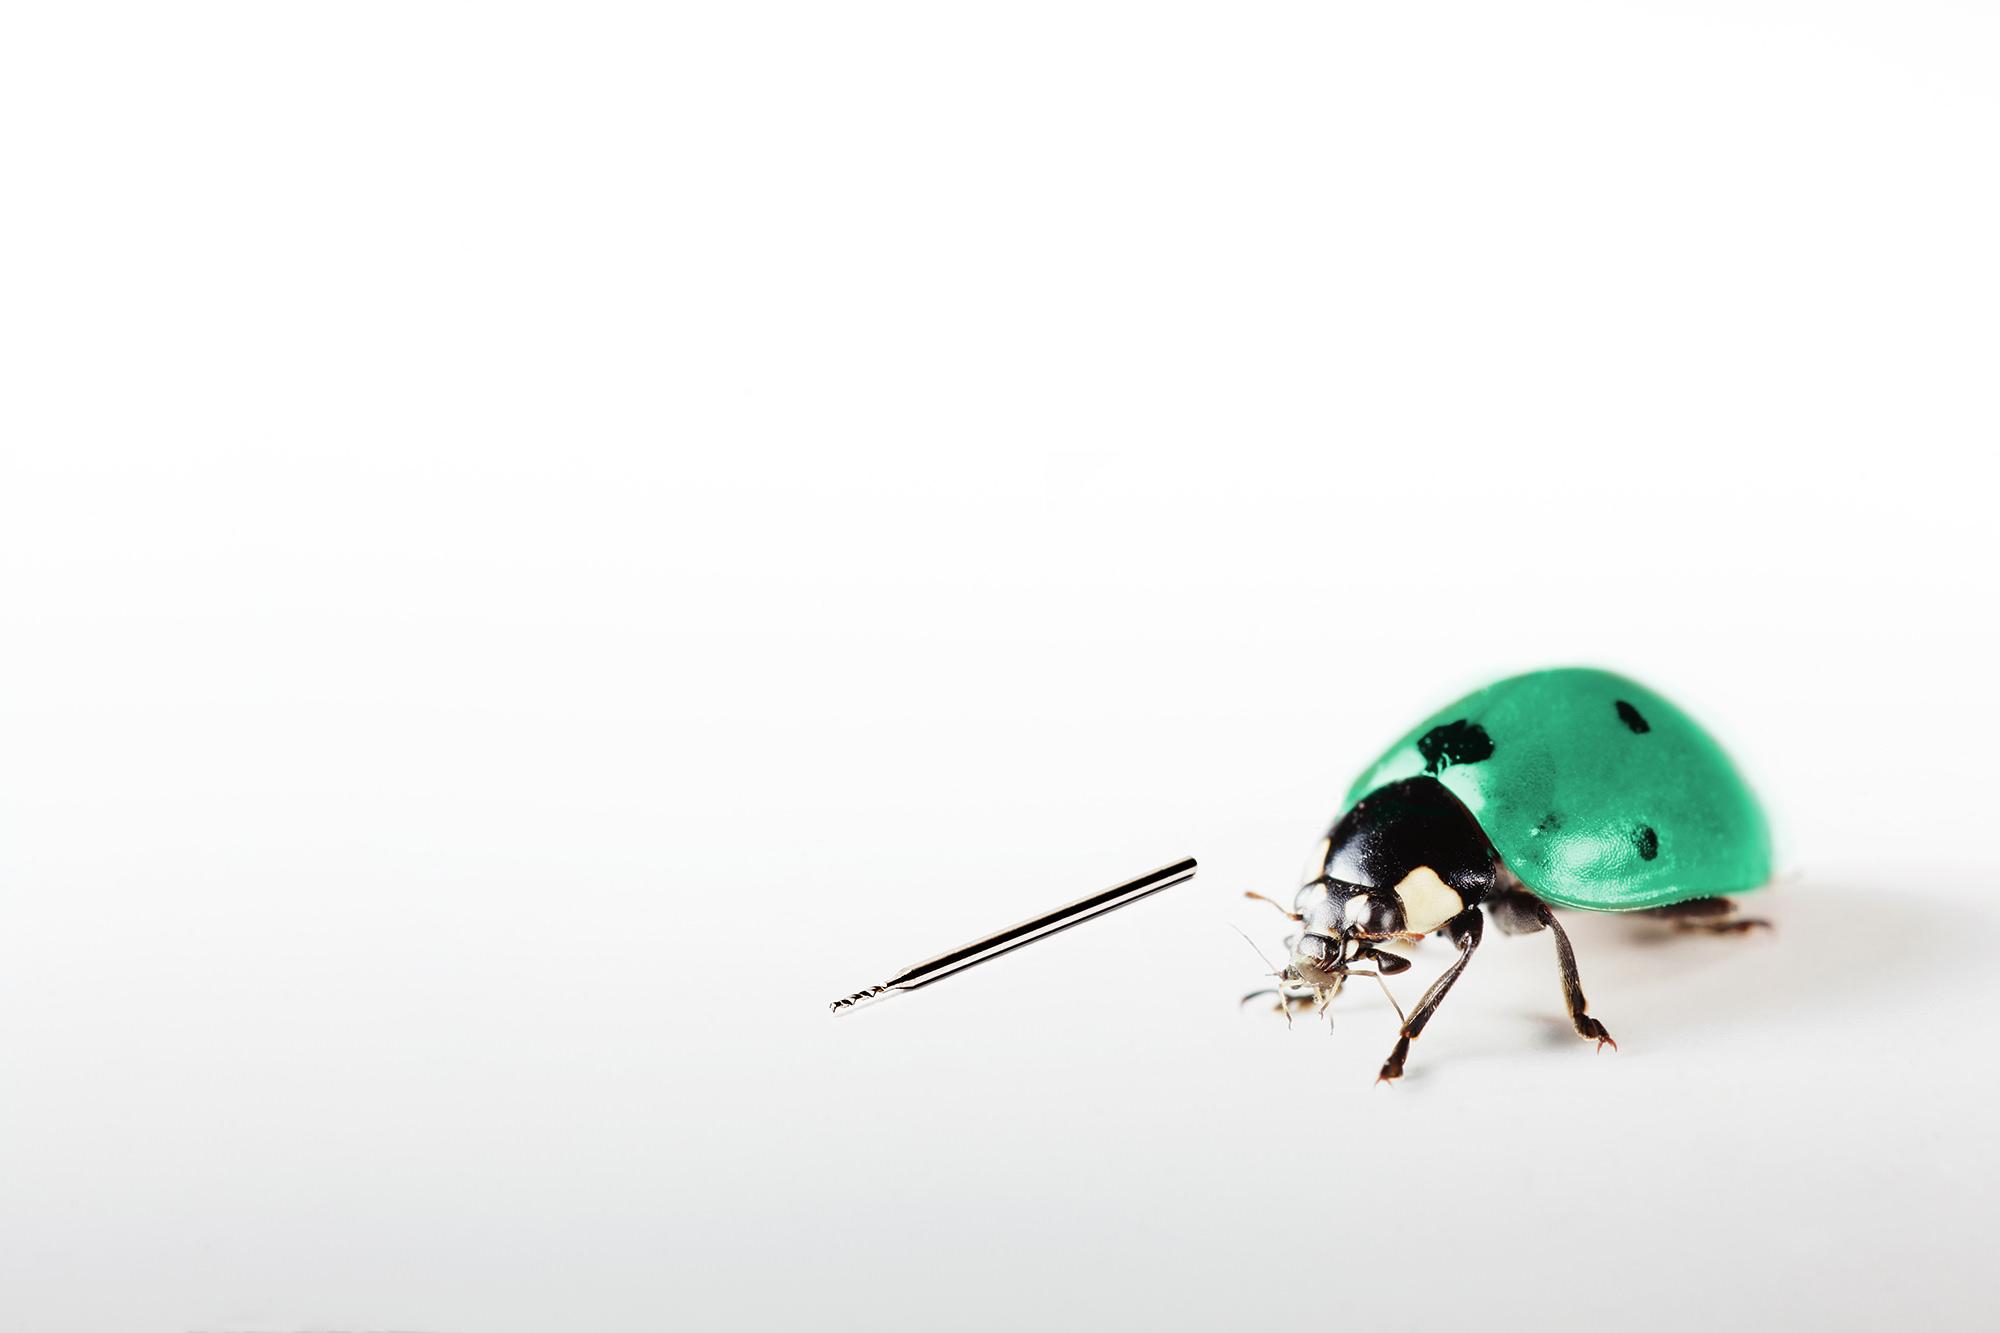 Micro Bohrer Hampp Tools Fotografie Tobias Ziegler für dasbomnm